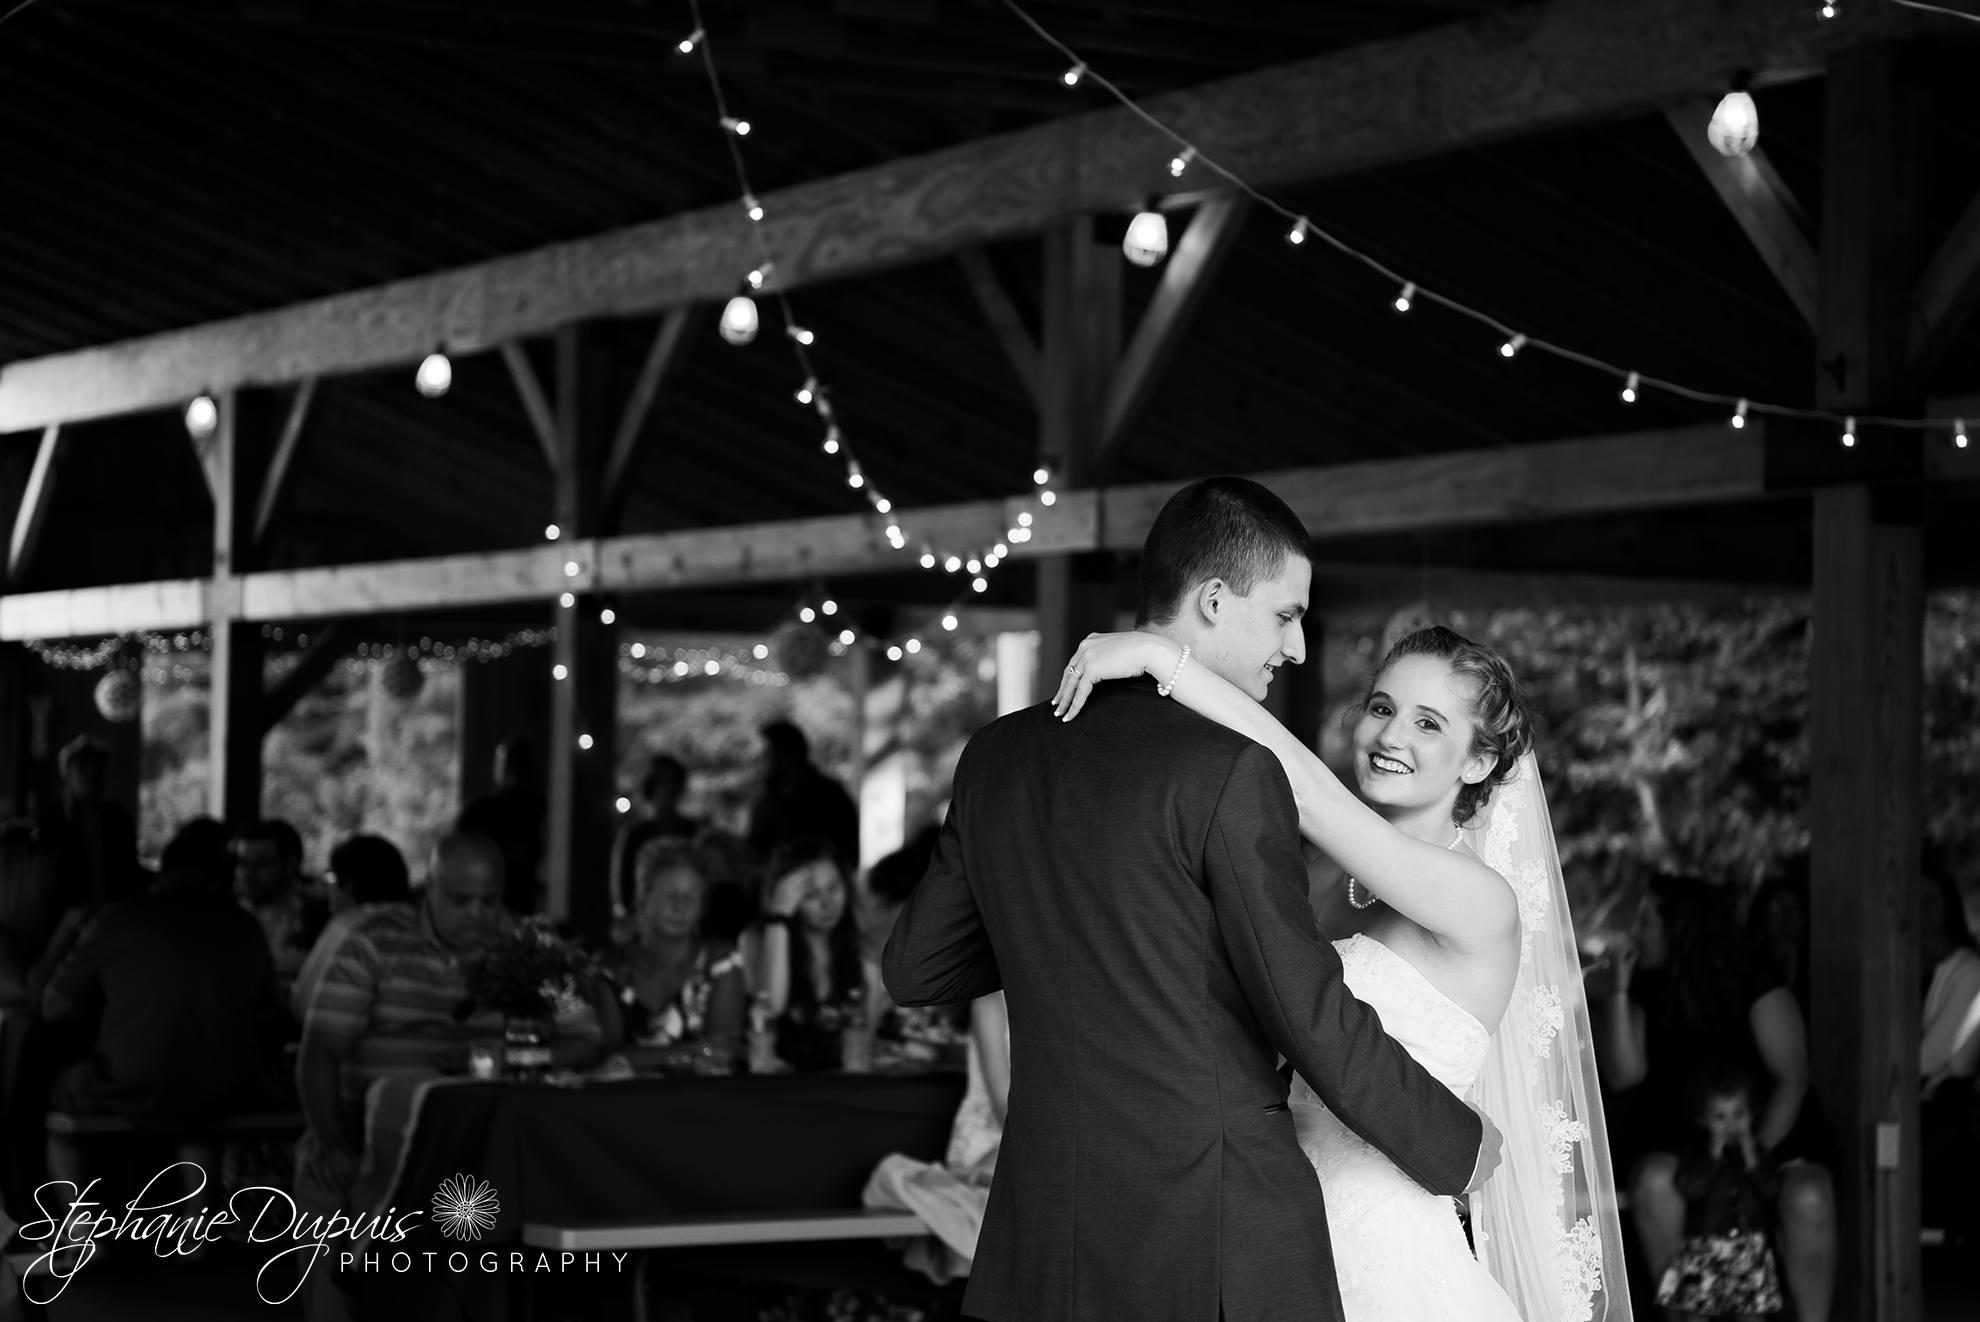 Littleton Wedding Photographer 02 2 - Portfolio: Ward Wedding